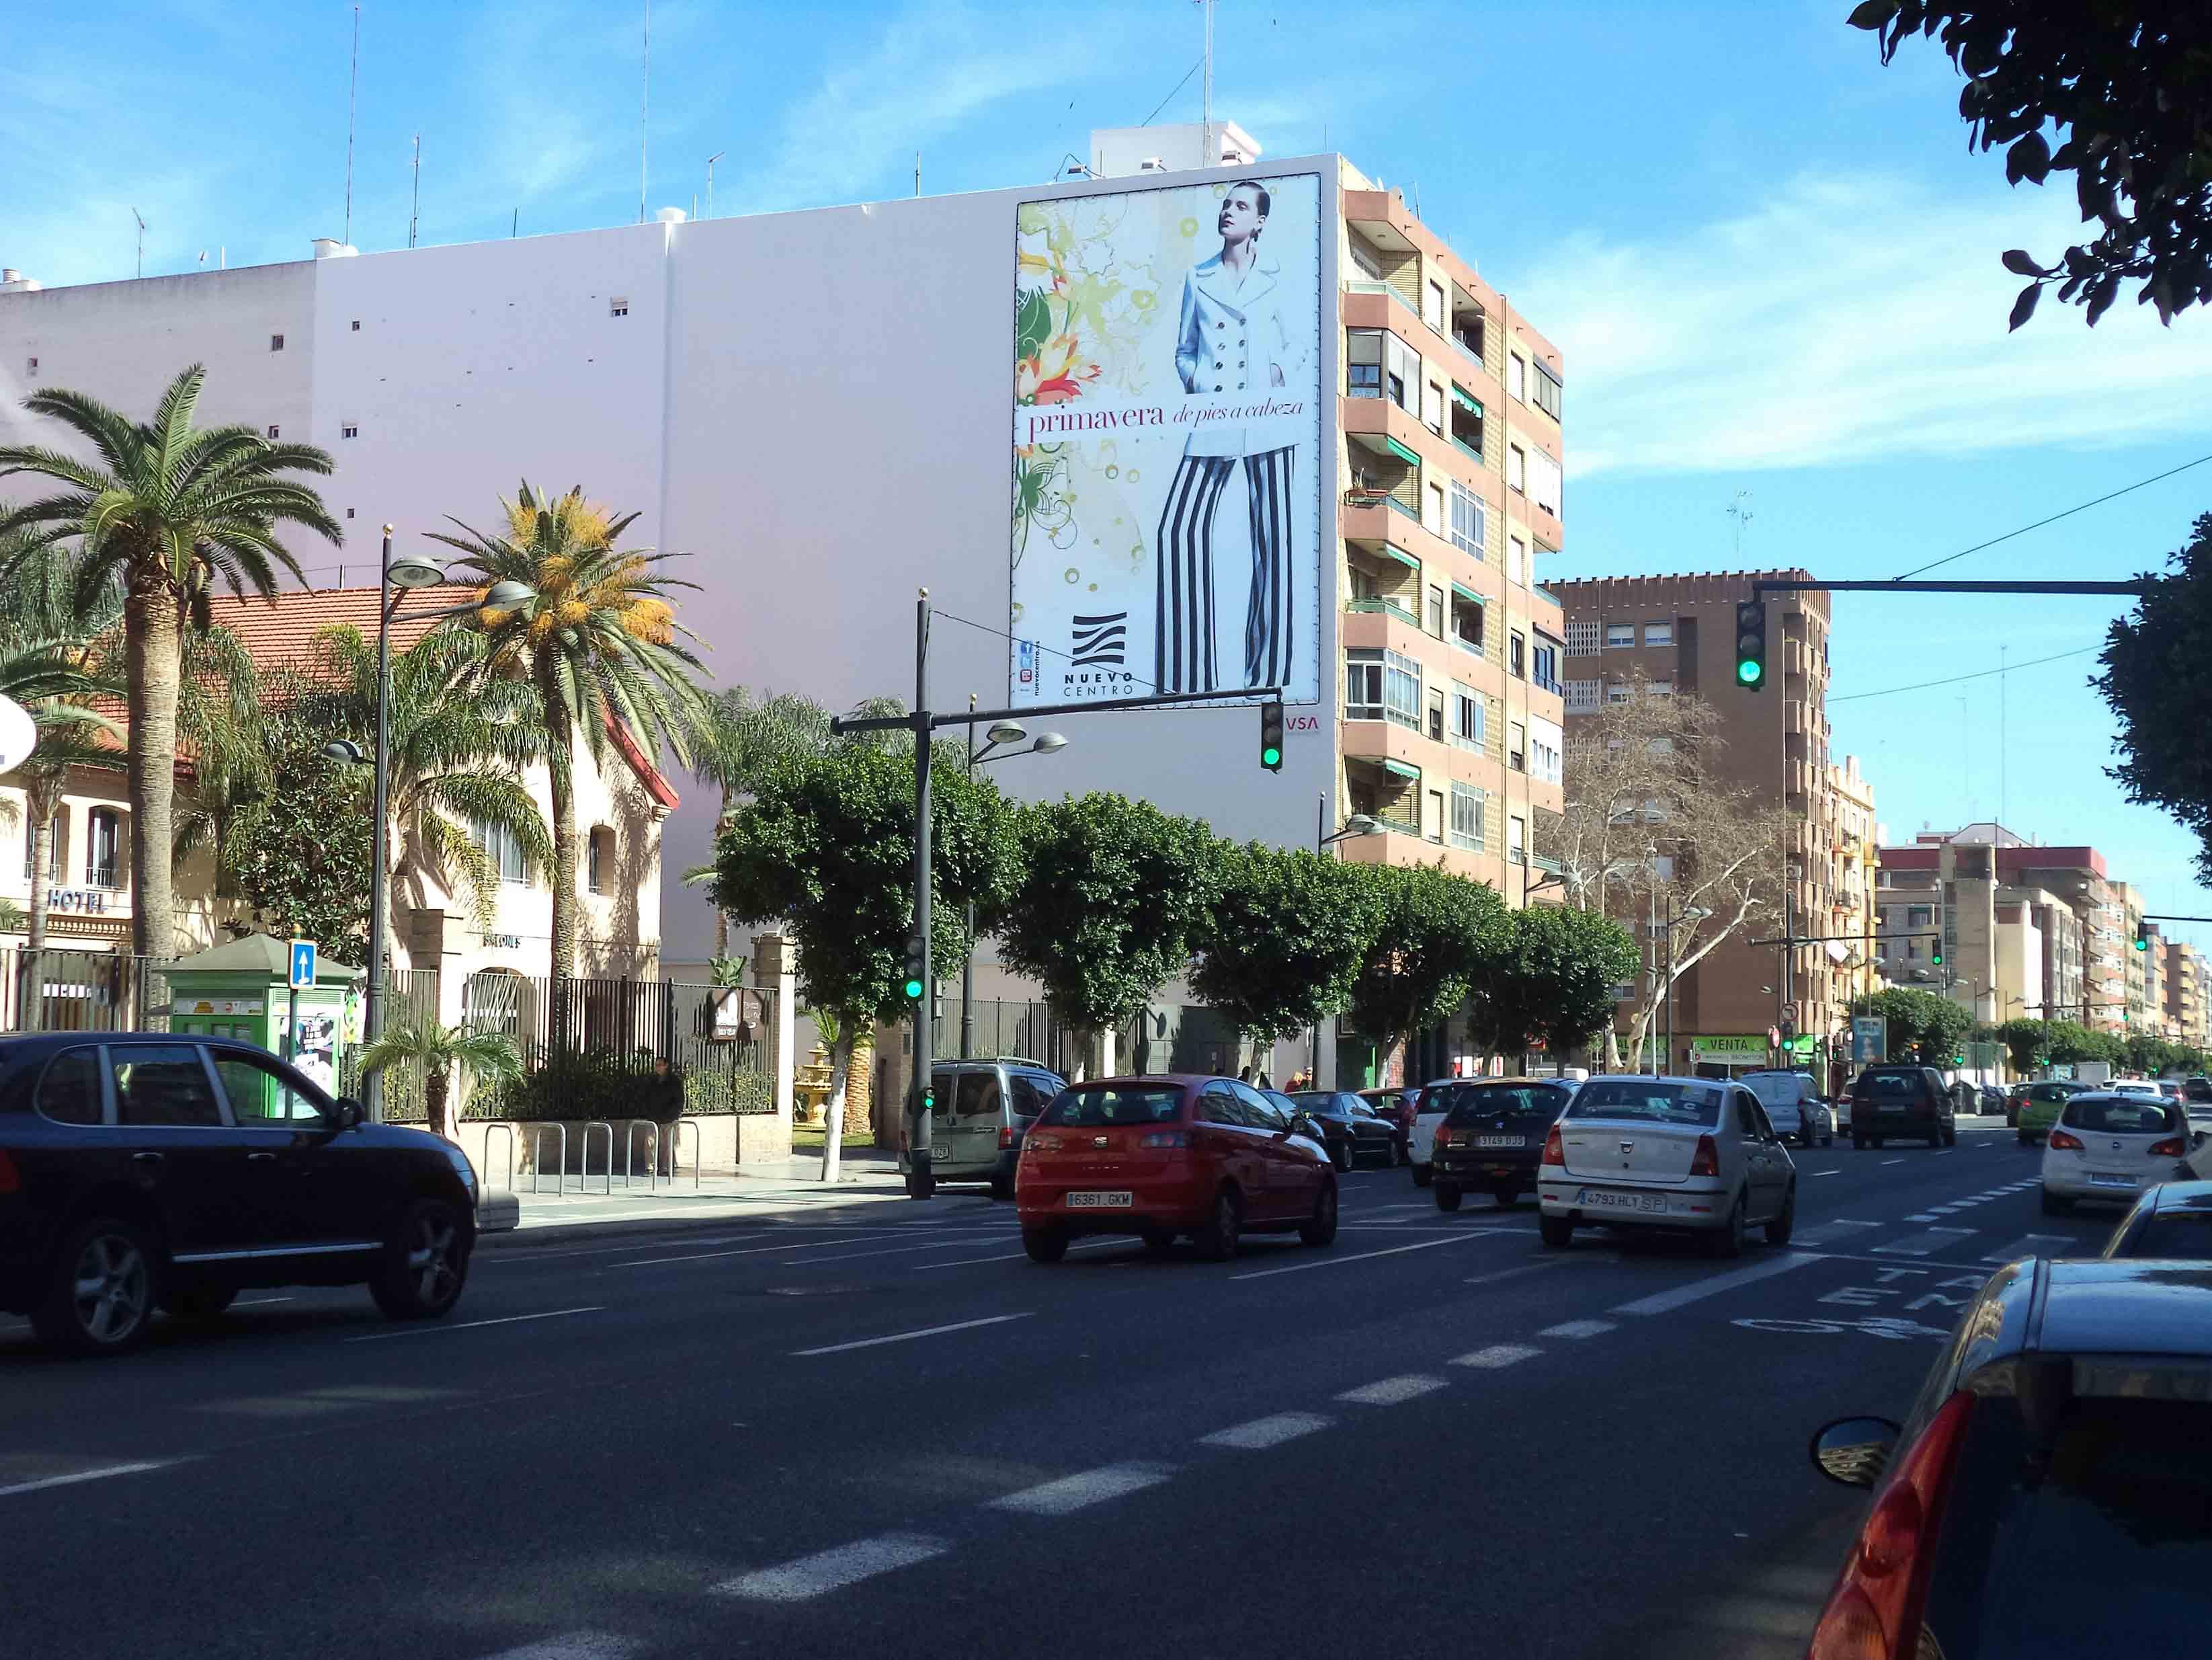 pym-valencia-avenida-del-puerto-nuevo-centro-marzo-vsa-comunicacion